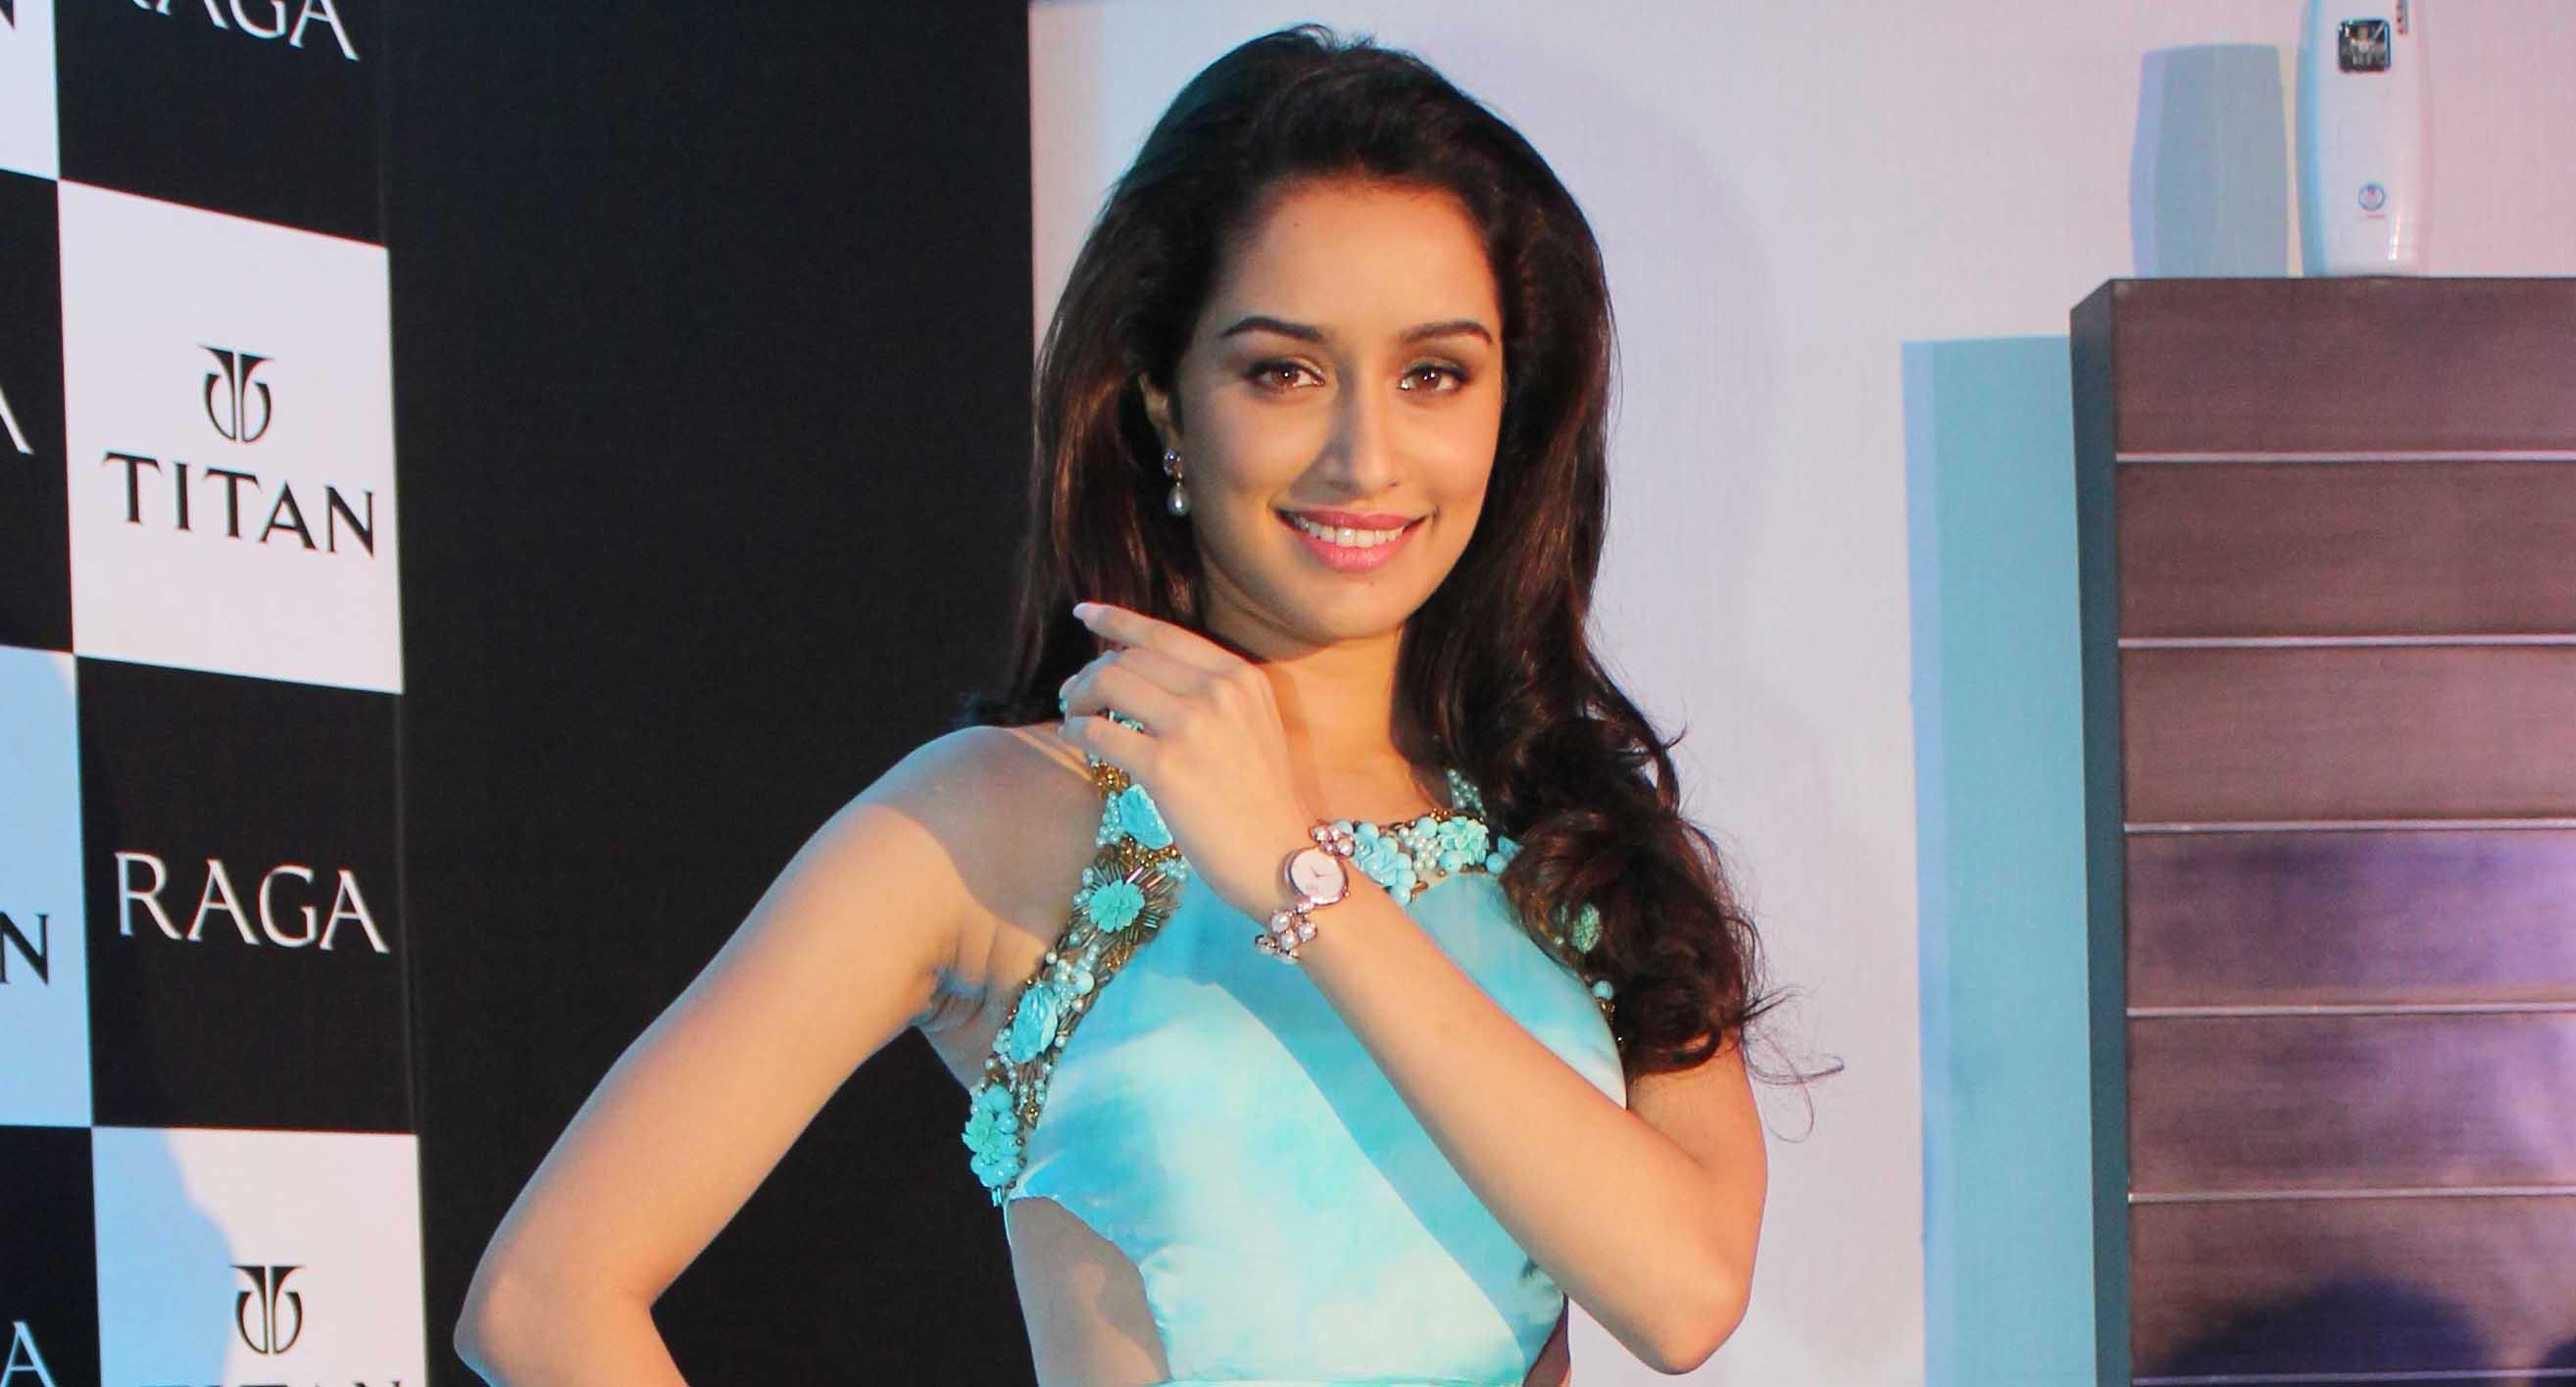 Beautiful Shraddha Kapoor Smiling Face Background Hd Mobile 2628x1415